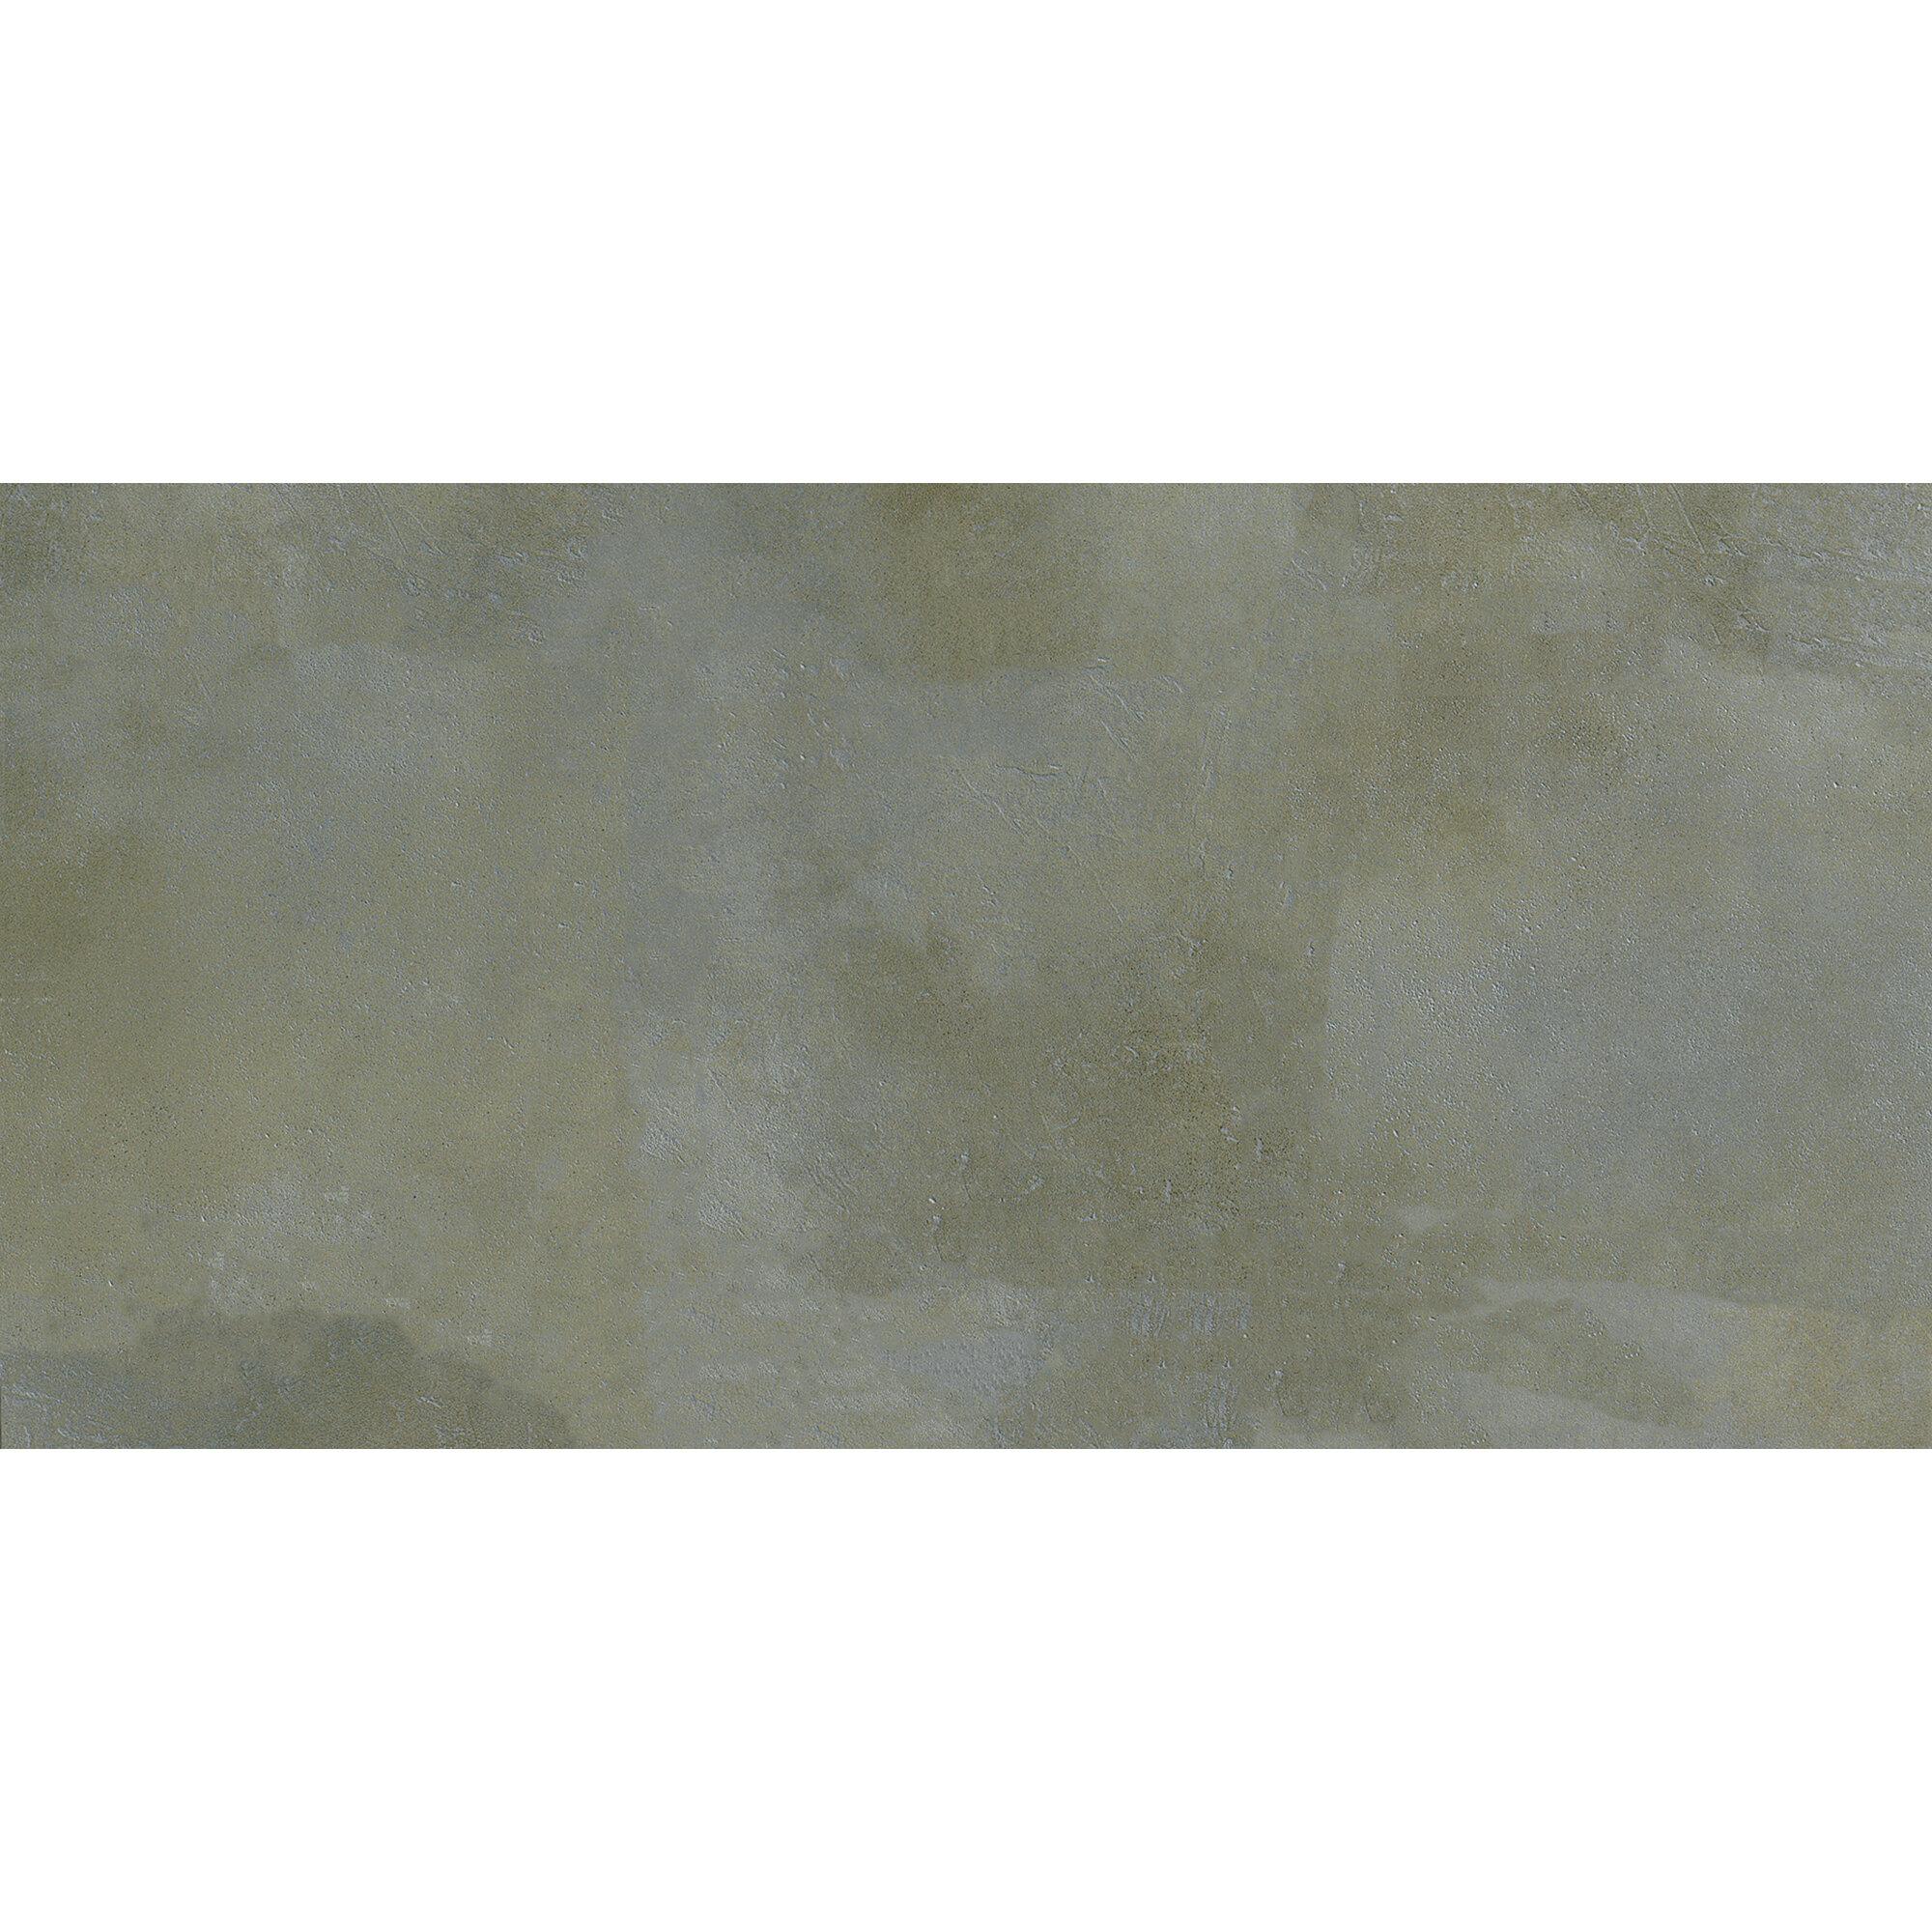 Matte Porcelain Bullnose Tile Trim